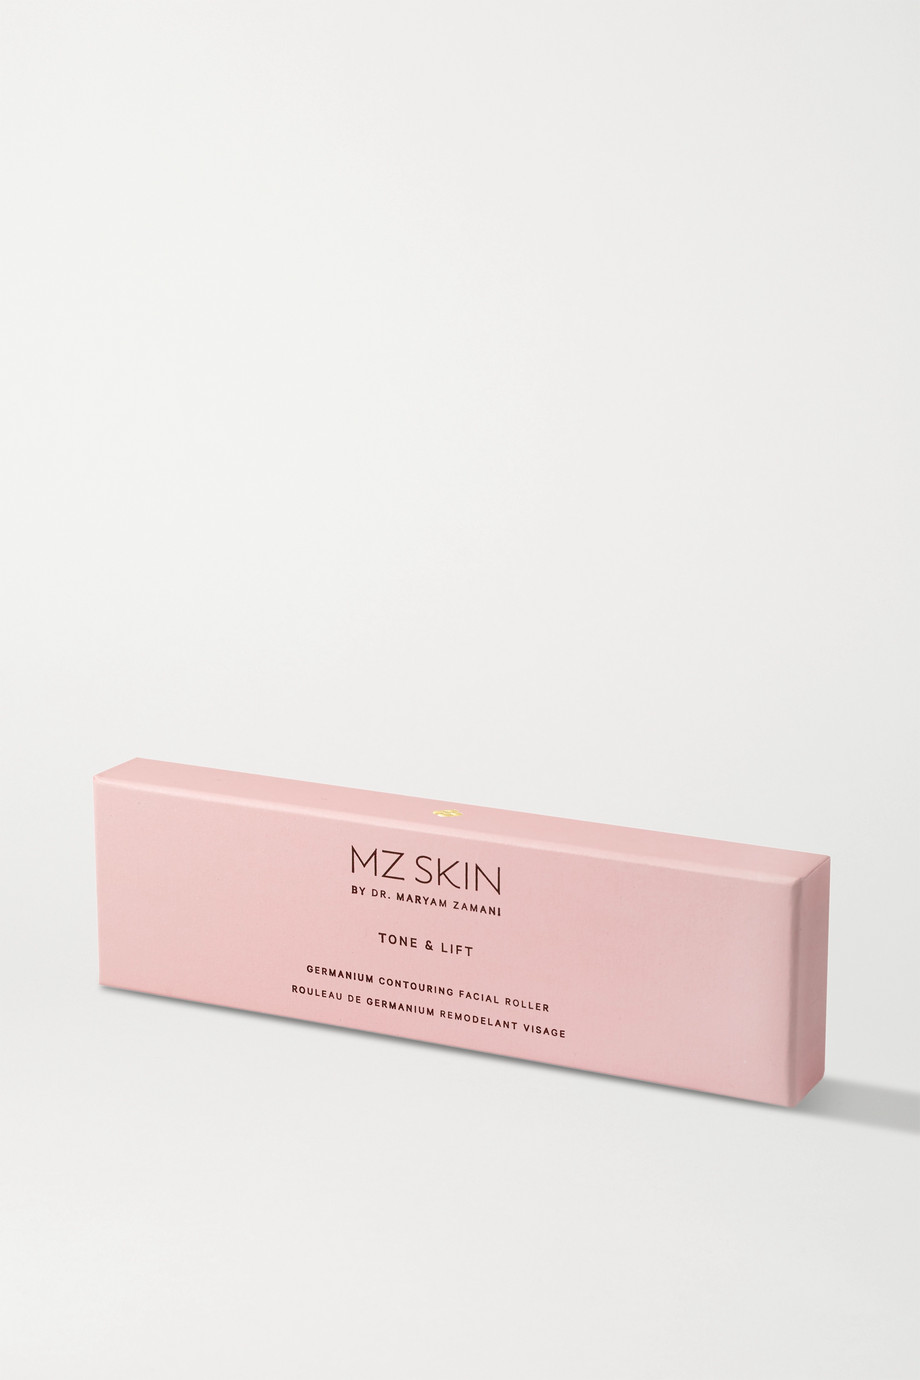 MZ Skin Germanium Contouring Facial Roller